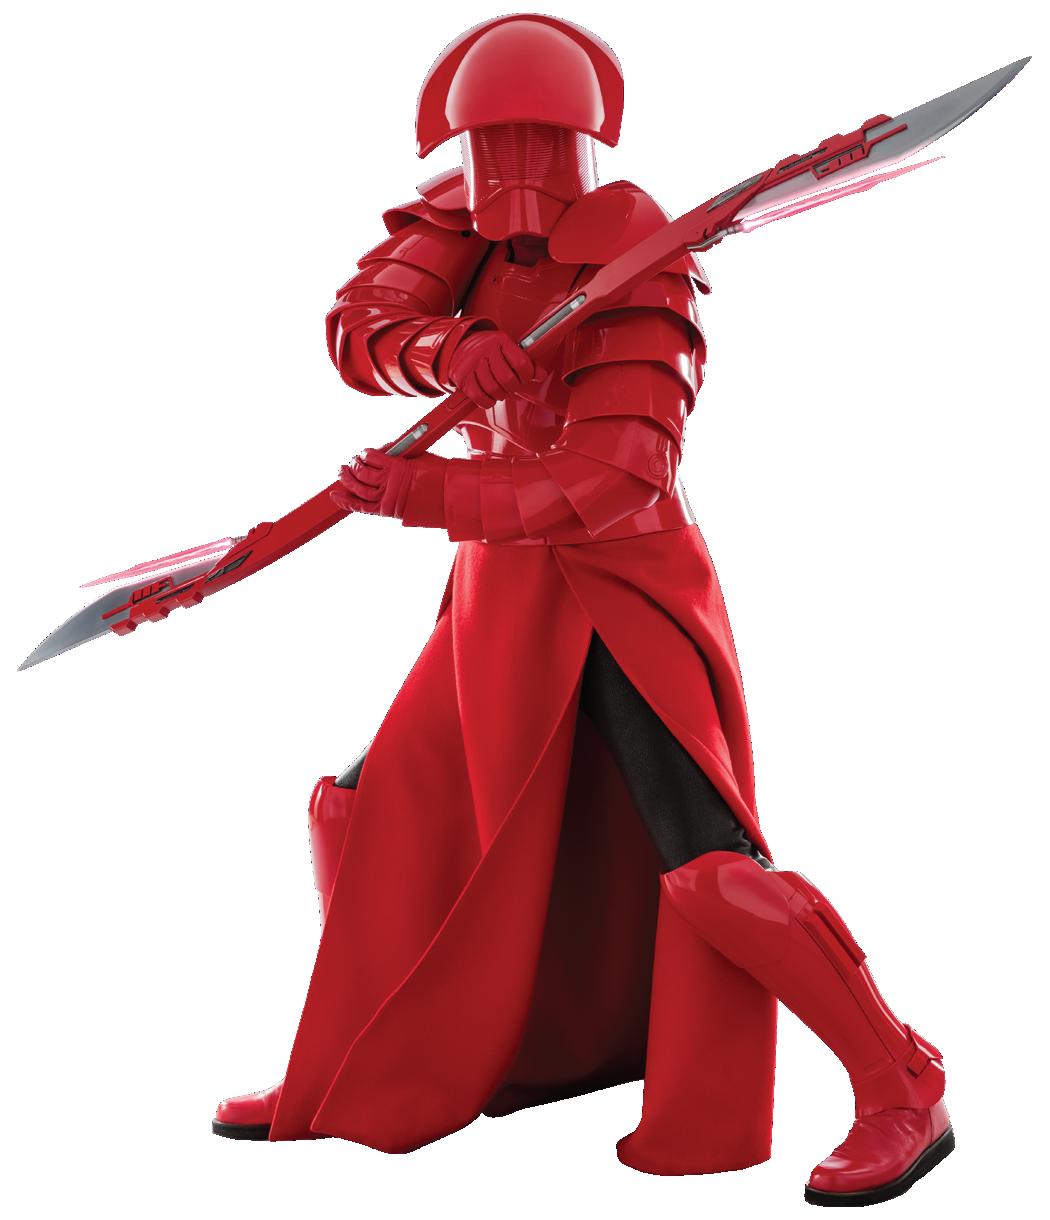 Elite Praetorian Guard   Wookieepedia   FANDOM powered by ...